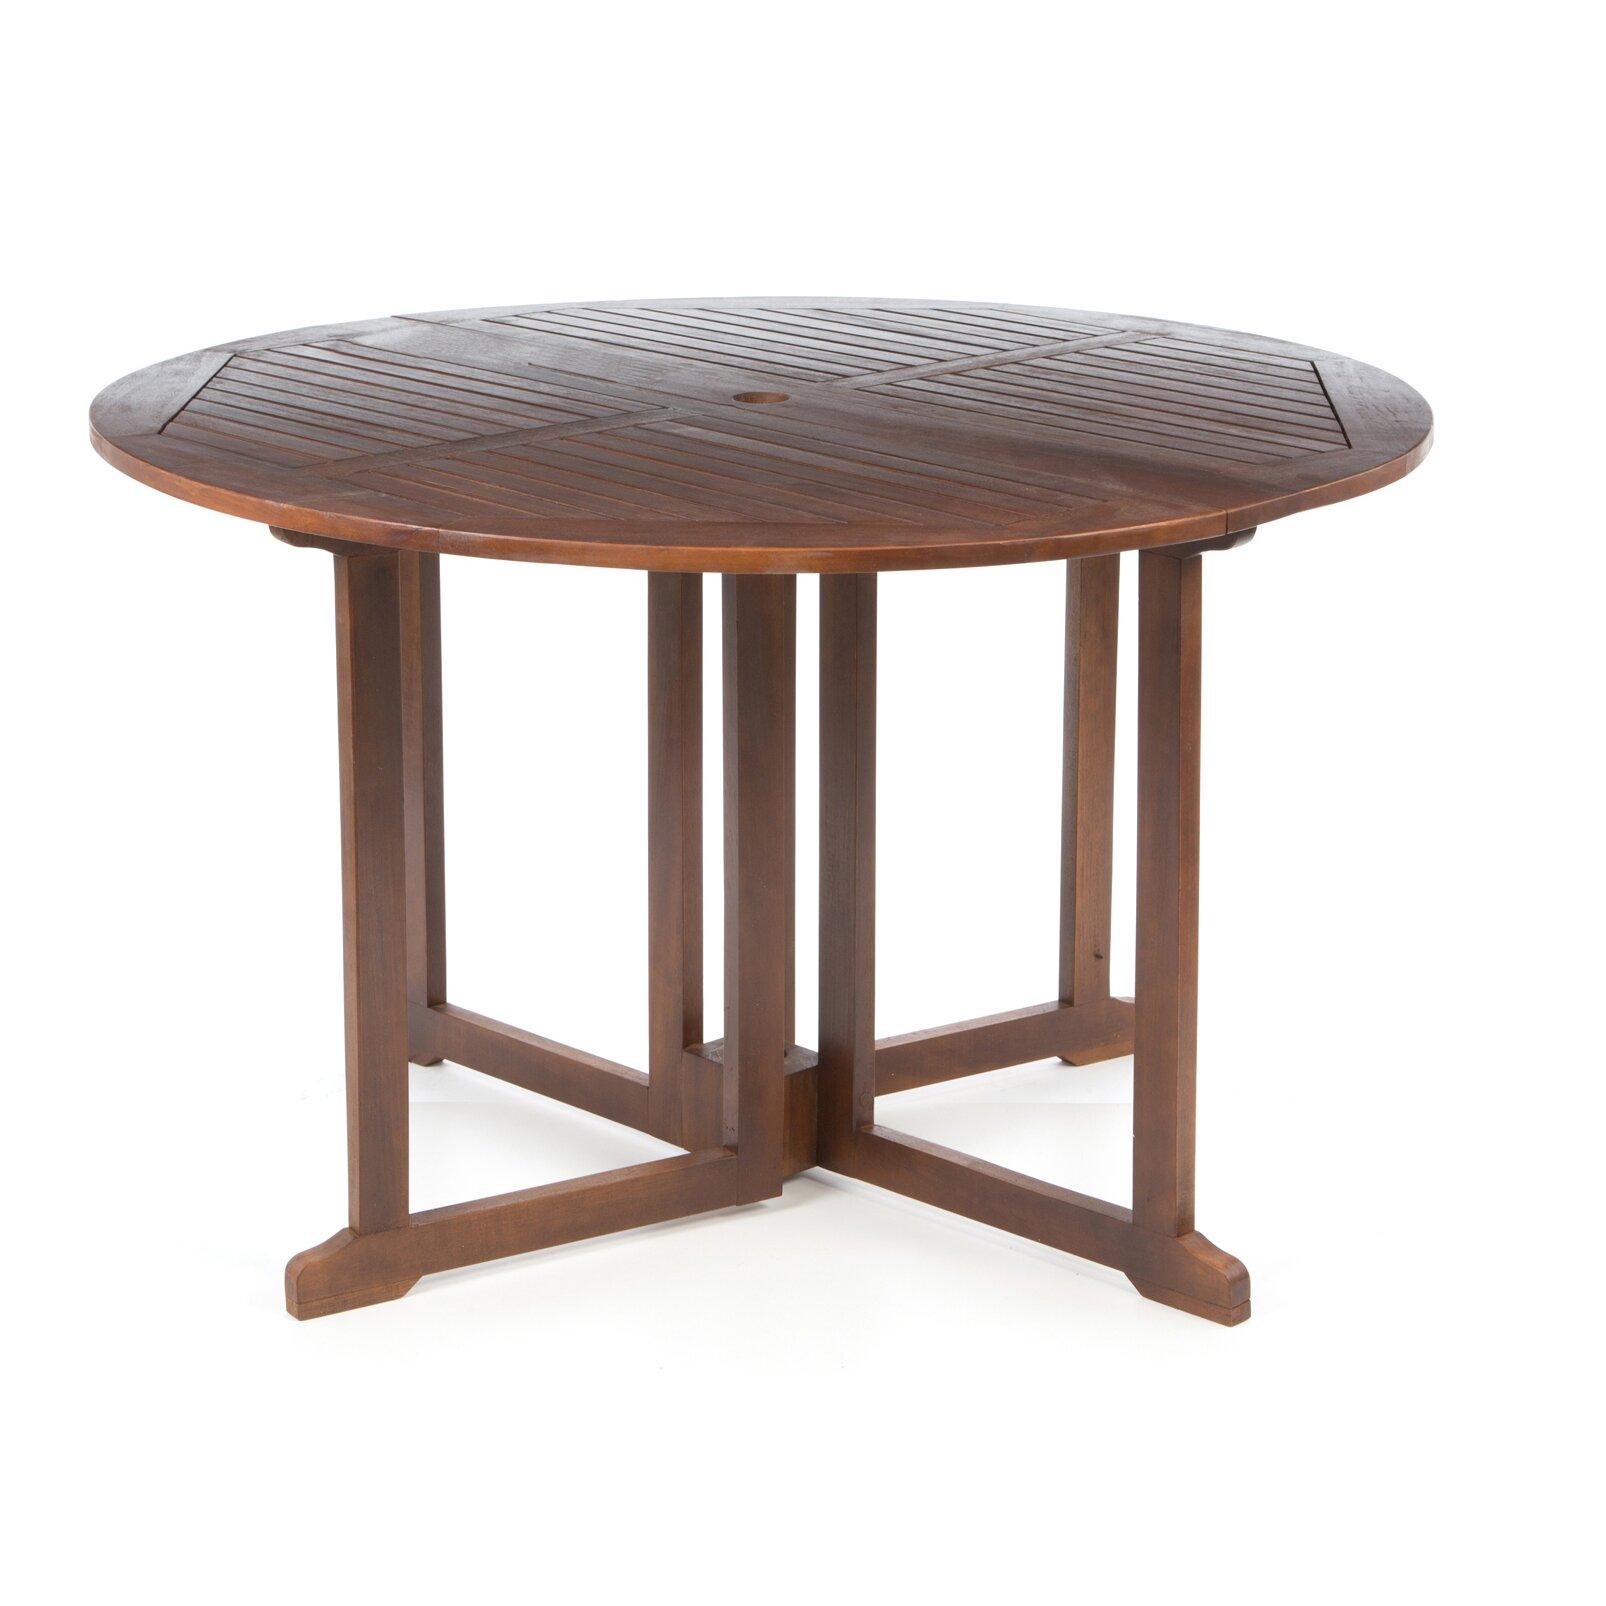 Loon Peak Dover Folding Dining Table & Reviews | Wayfair